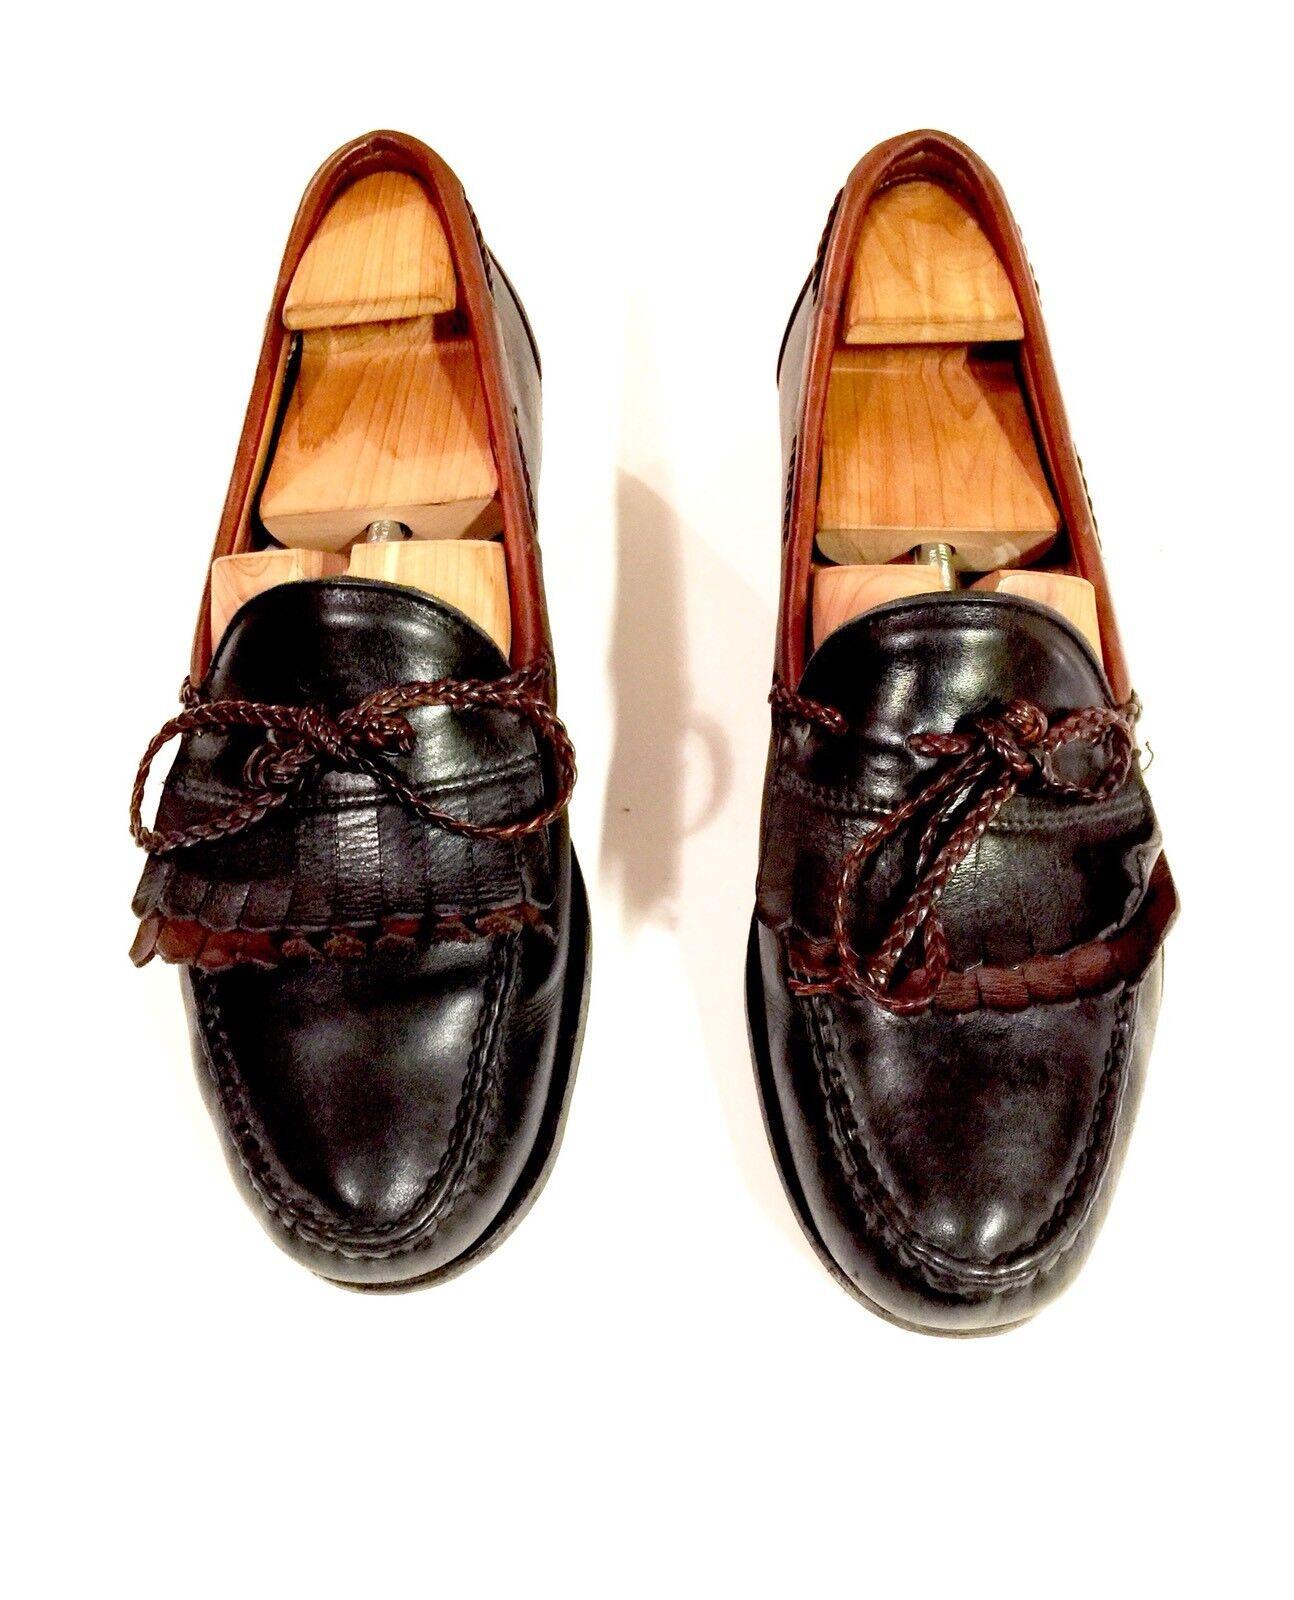 ALLEN EDMONDS Men's Dress shoes Loafer Sz 10.5D Brown Two Tone Leather WOODSTOCK